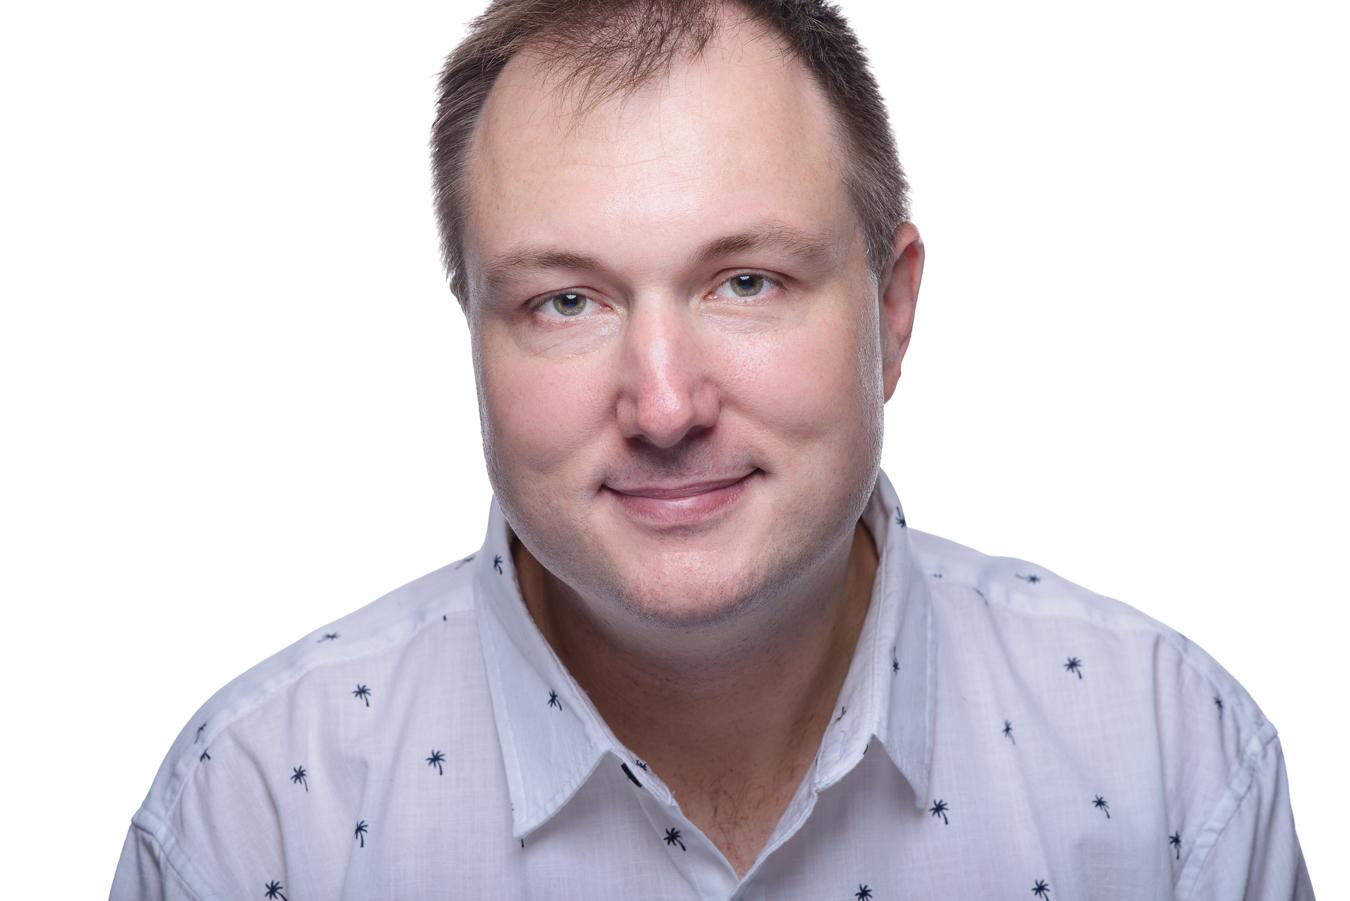 Bryan Legen